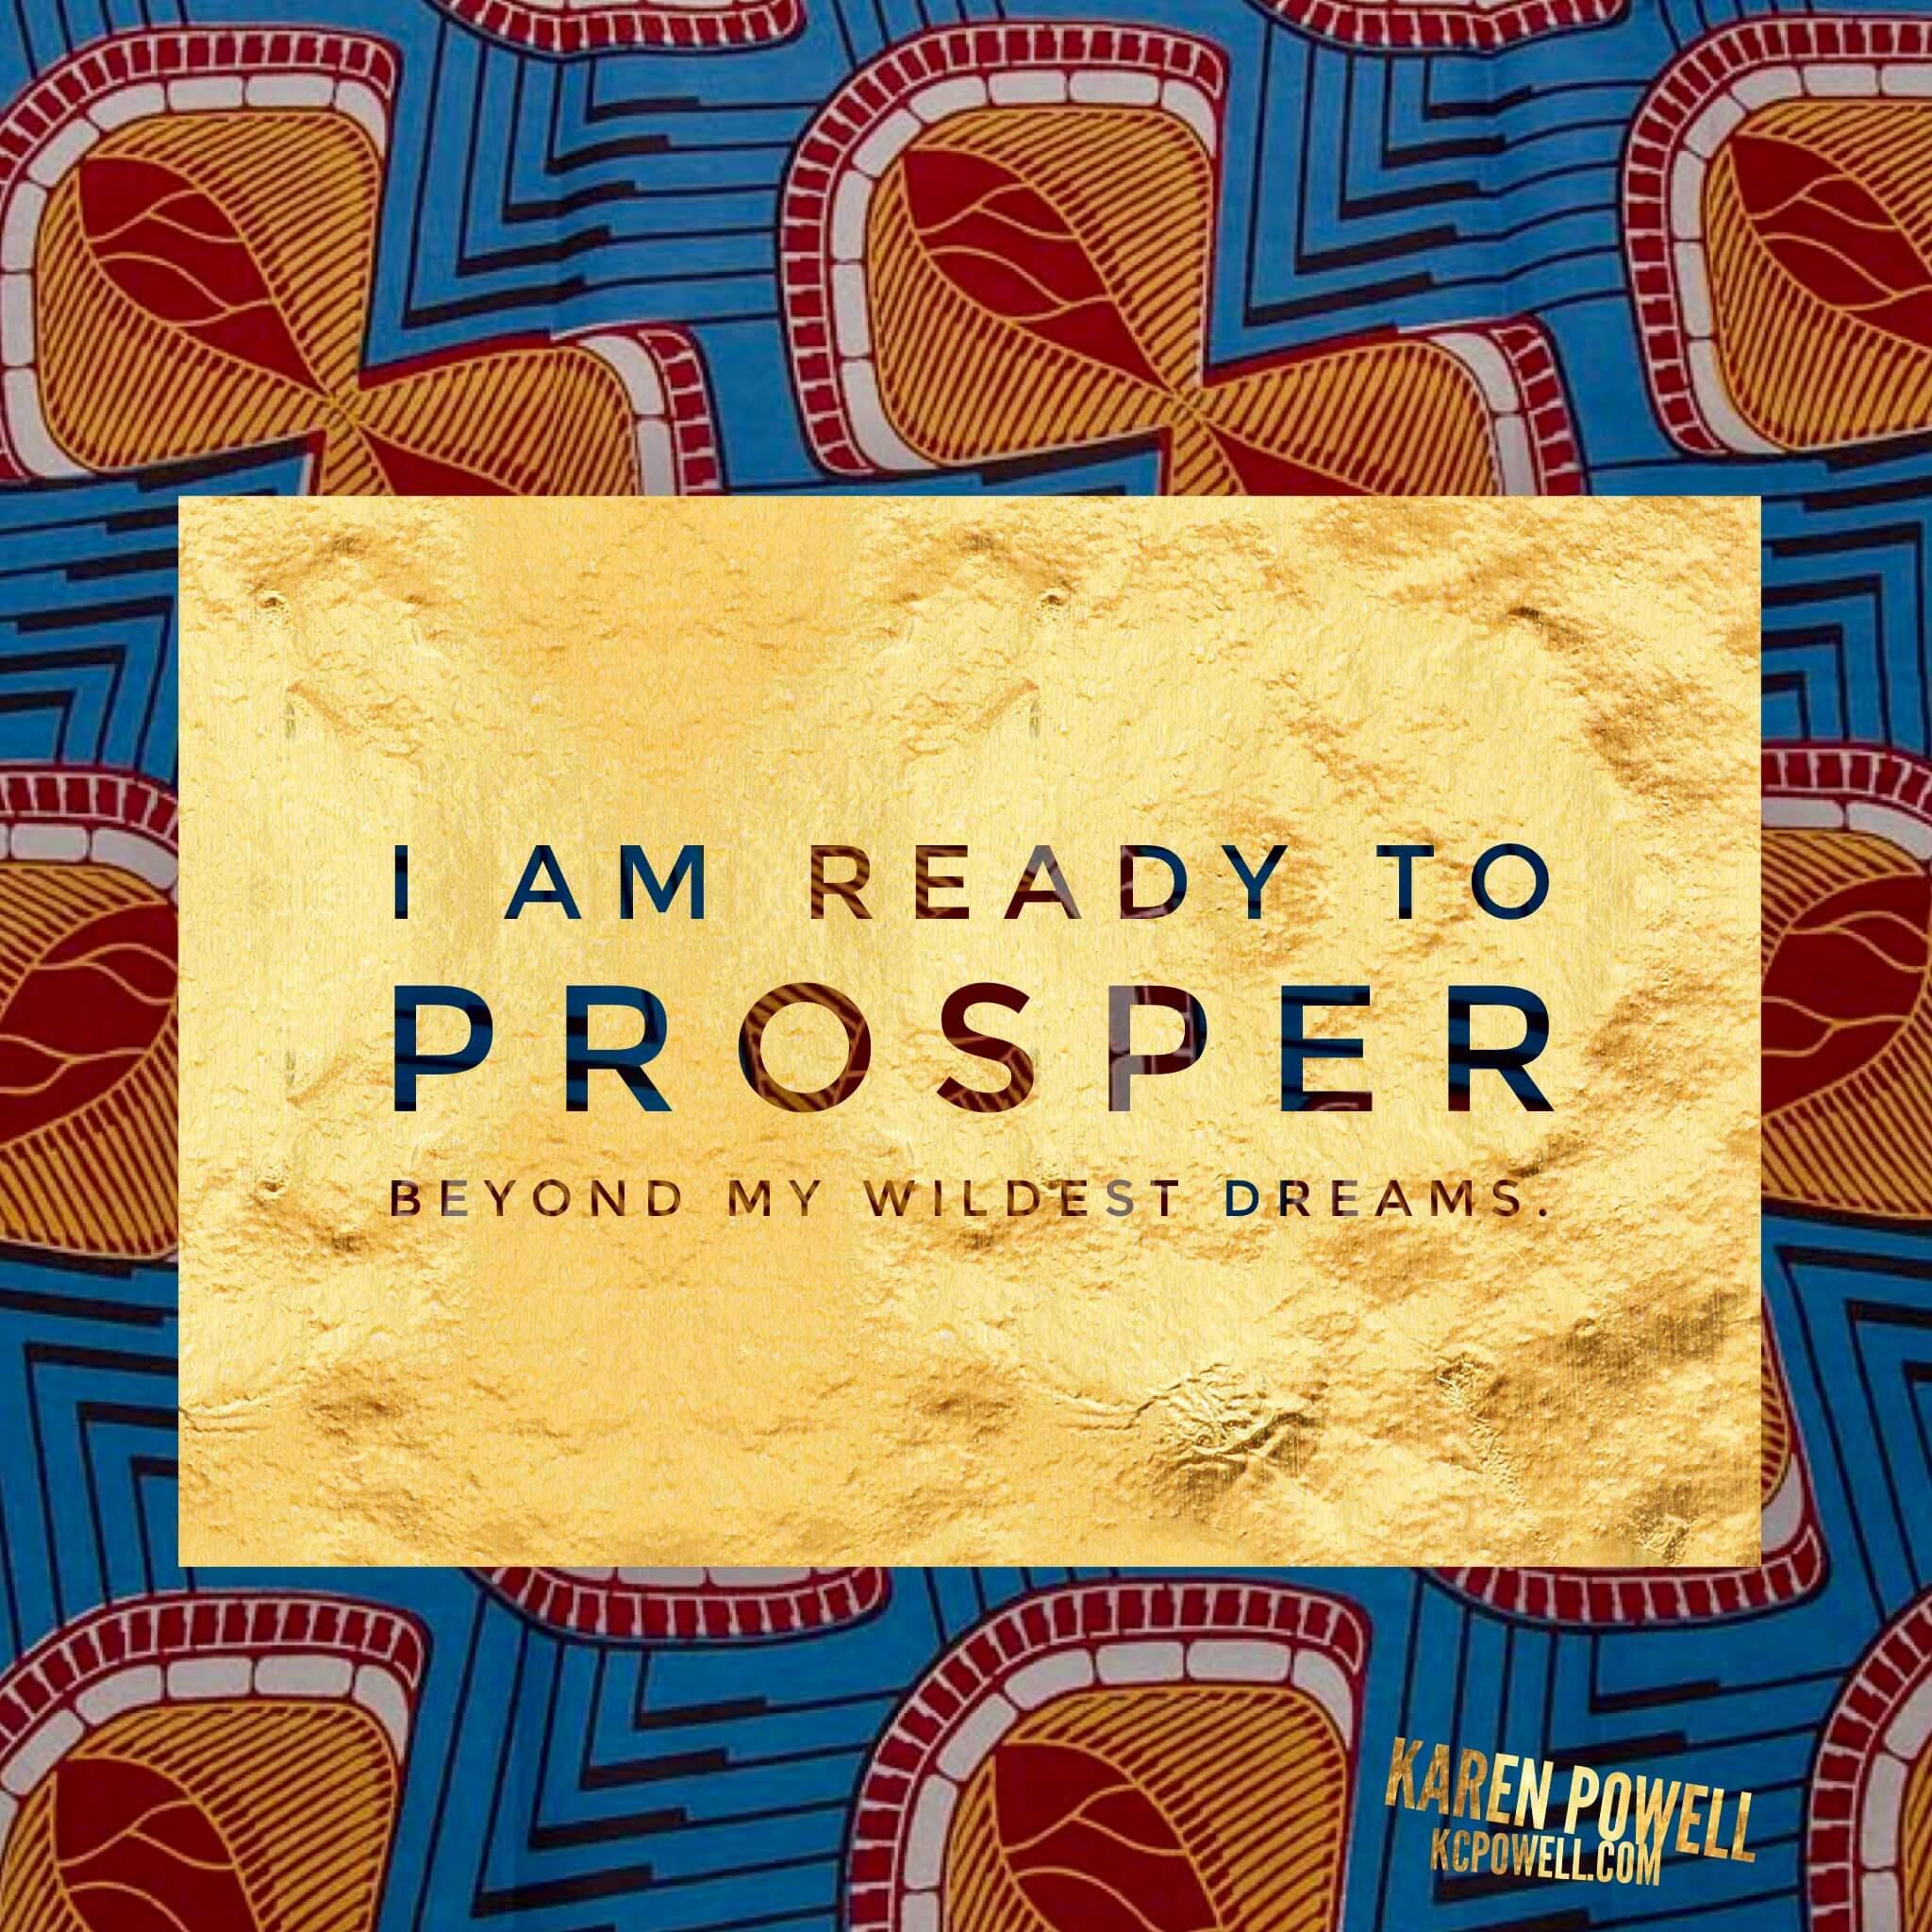 I am ready to prosper beyond my wildest dreams